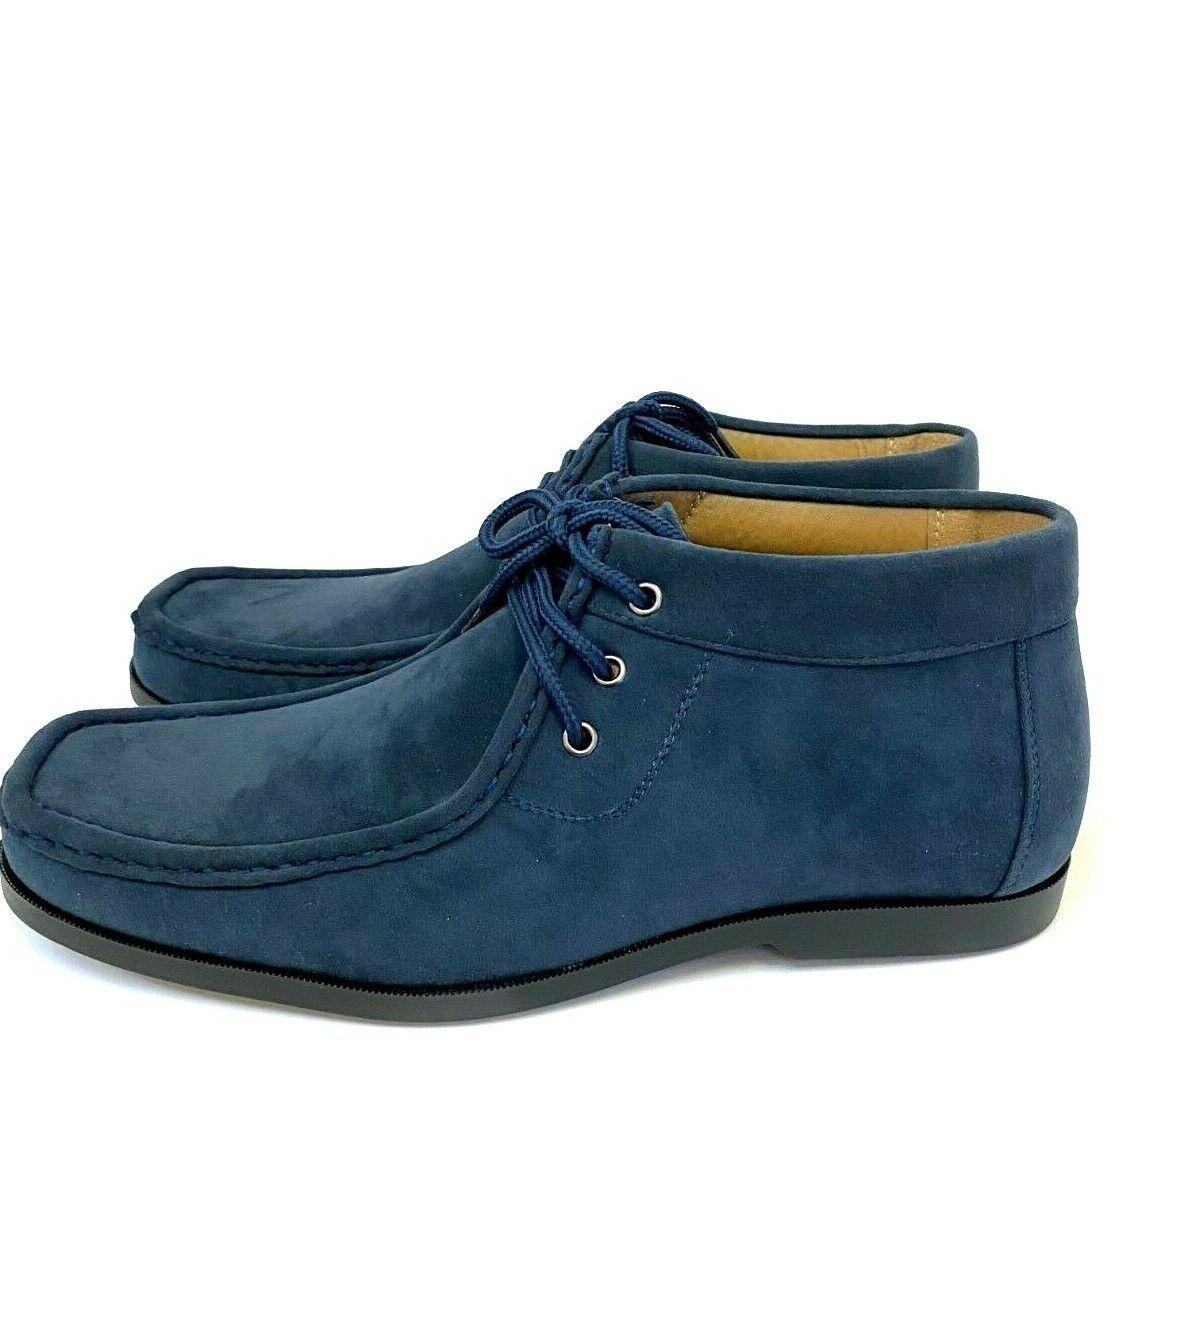 Faranzi FB4787 Men's Wallabees Shoes Ankle Boots Navy Micro-Fiber Suede